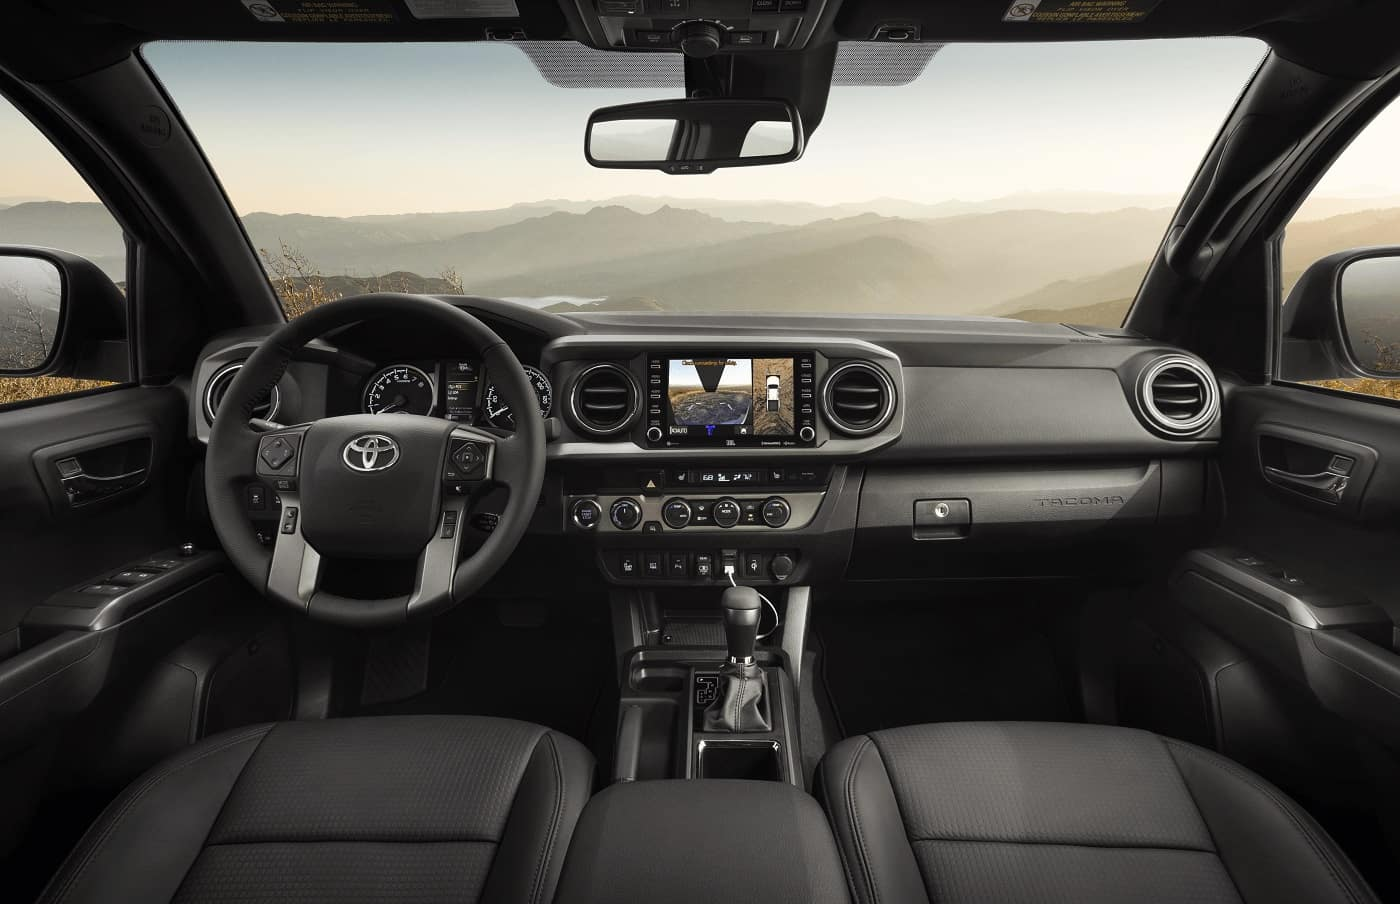 Toyota Tacoma Interior Cabin